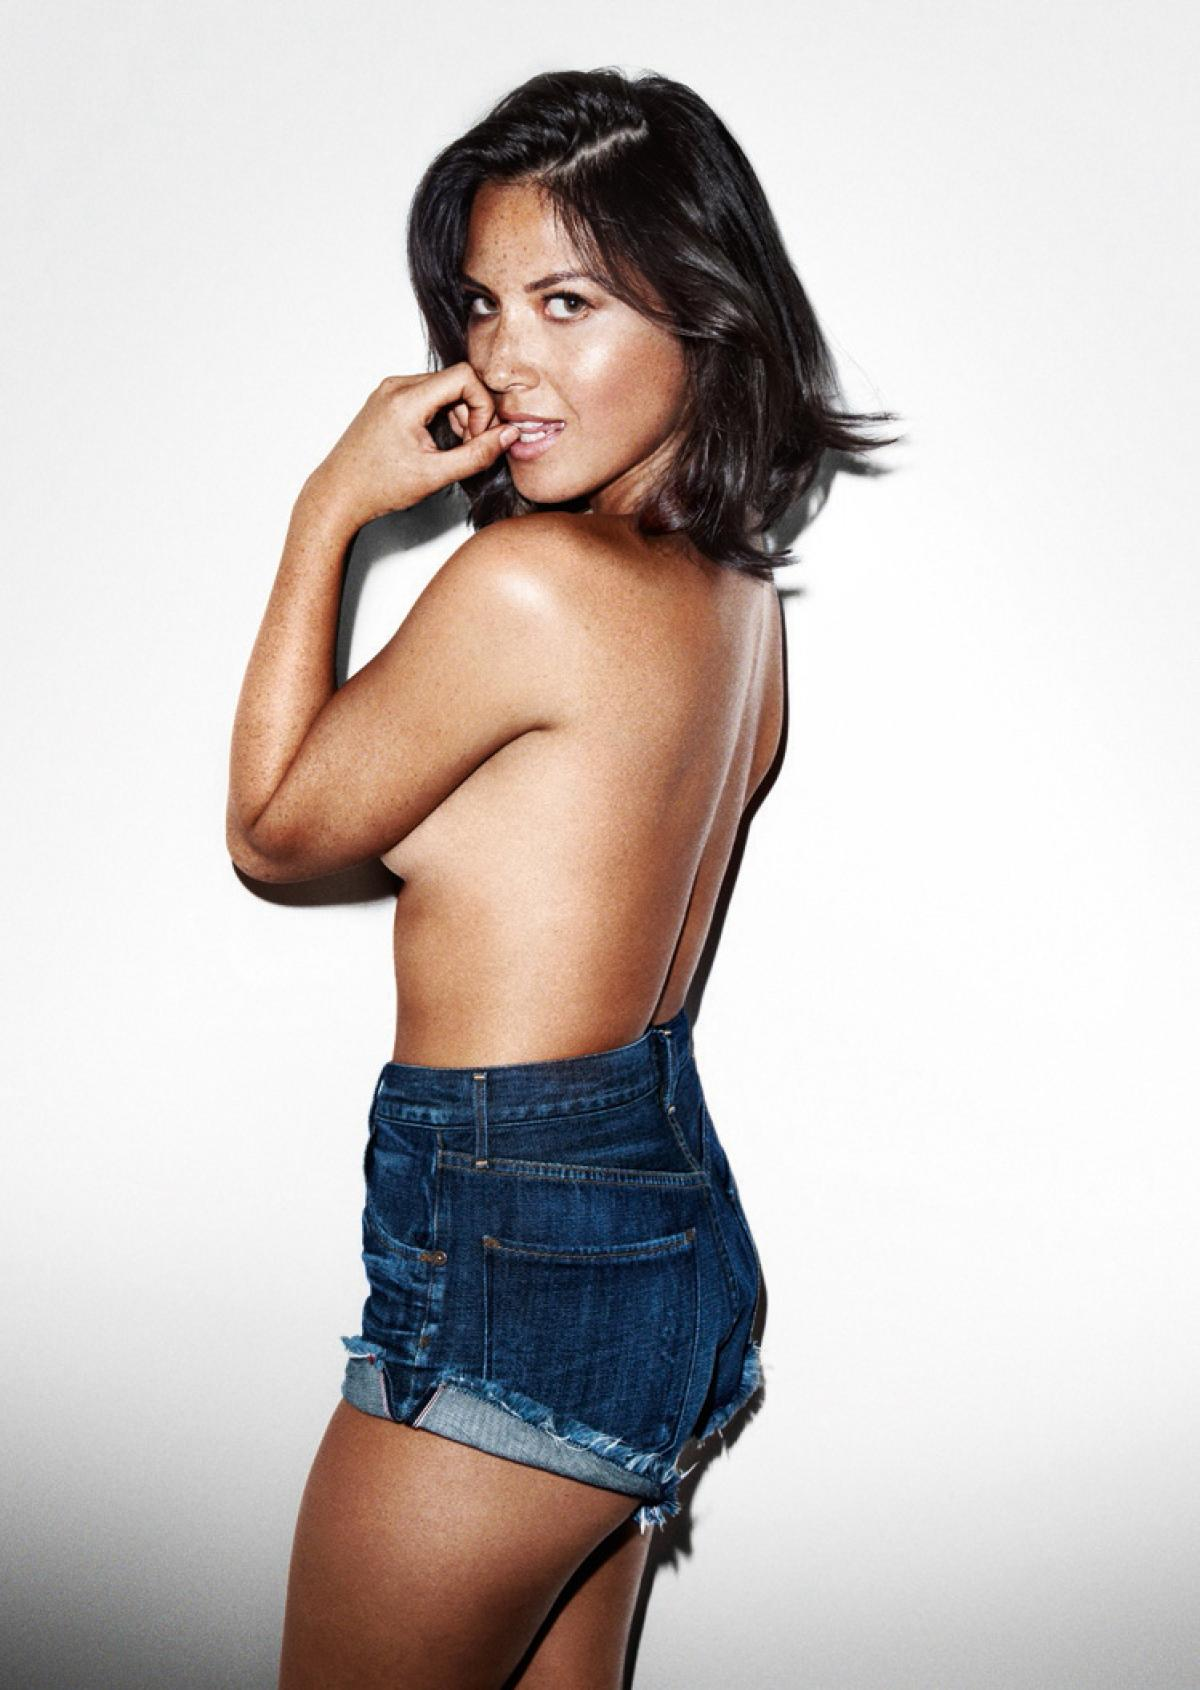 Olivia Munn Topless (1)